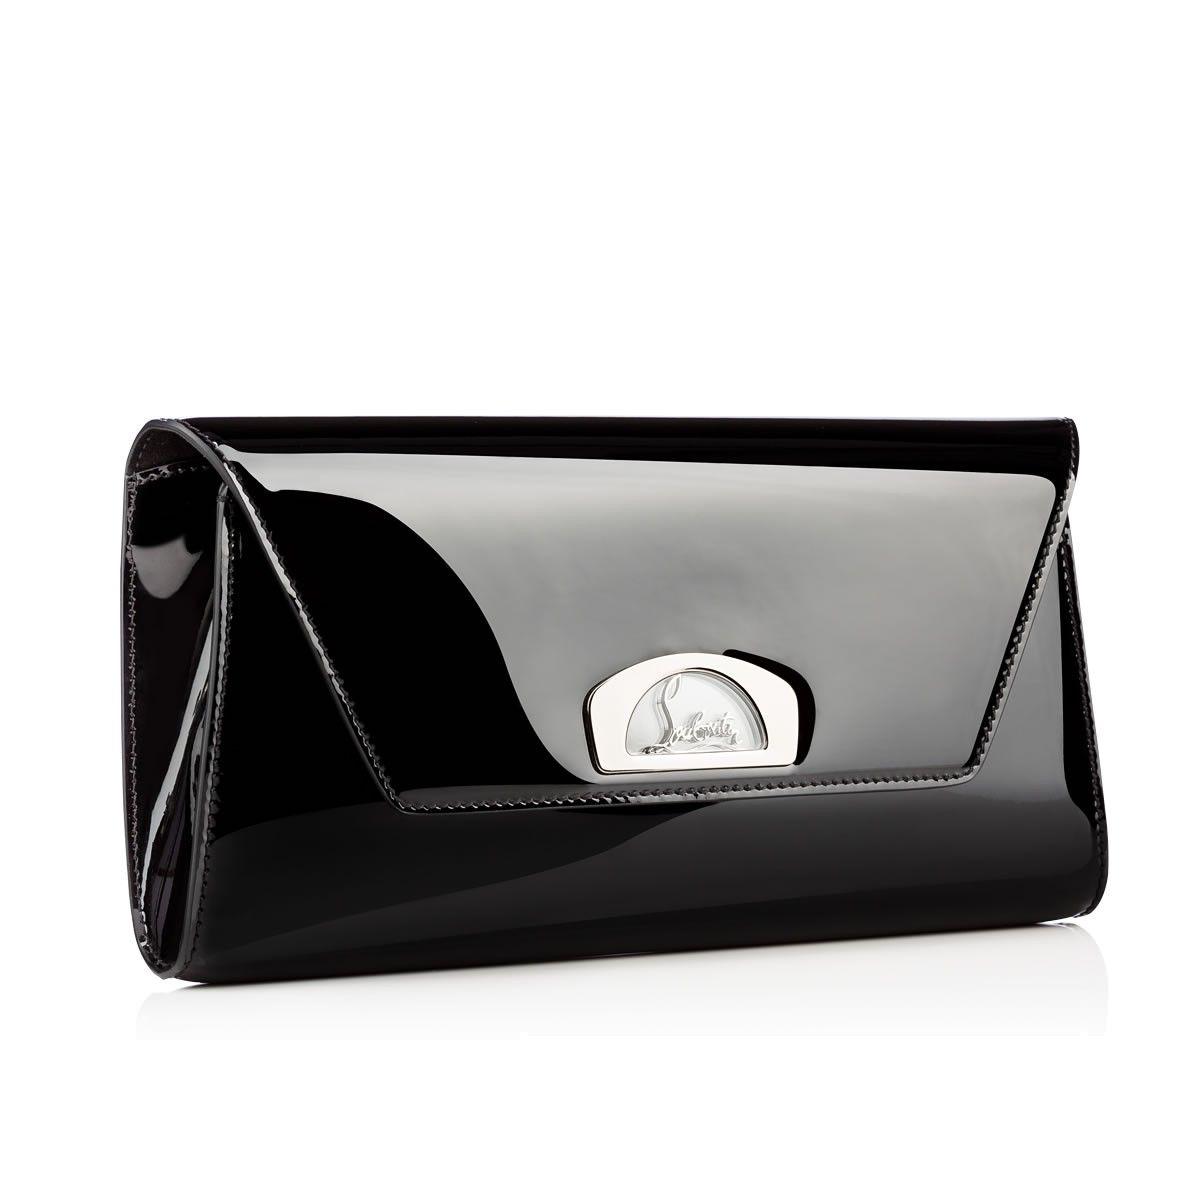 Vero Dodat black patent leather clutch Christian Louboutin vlTTzwTTk